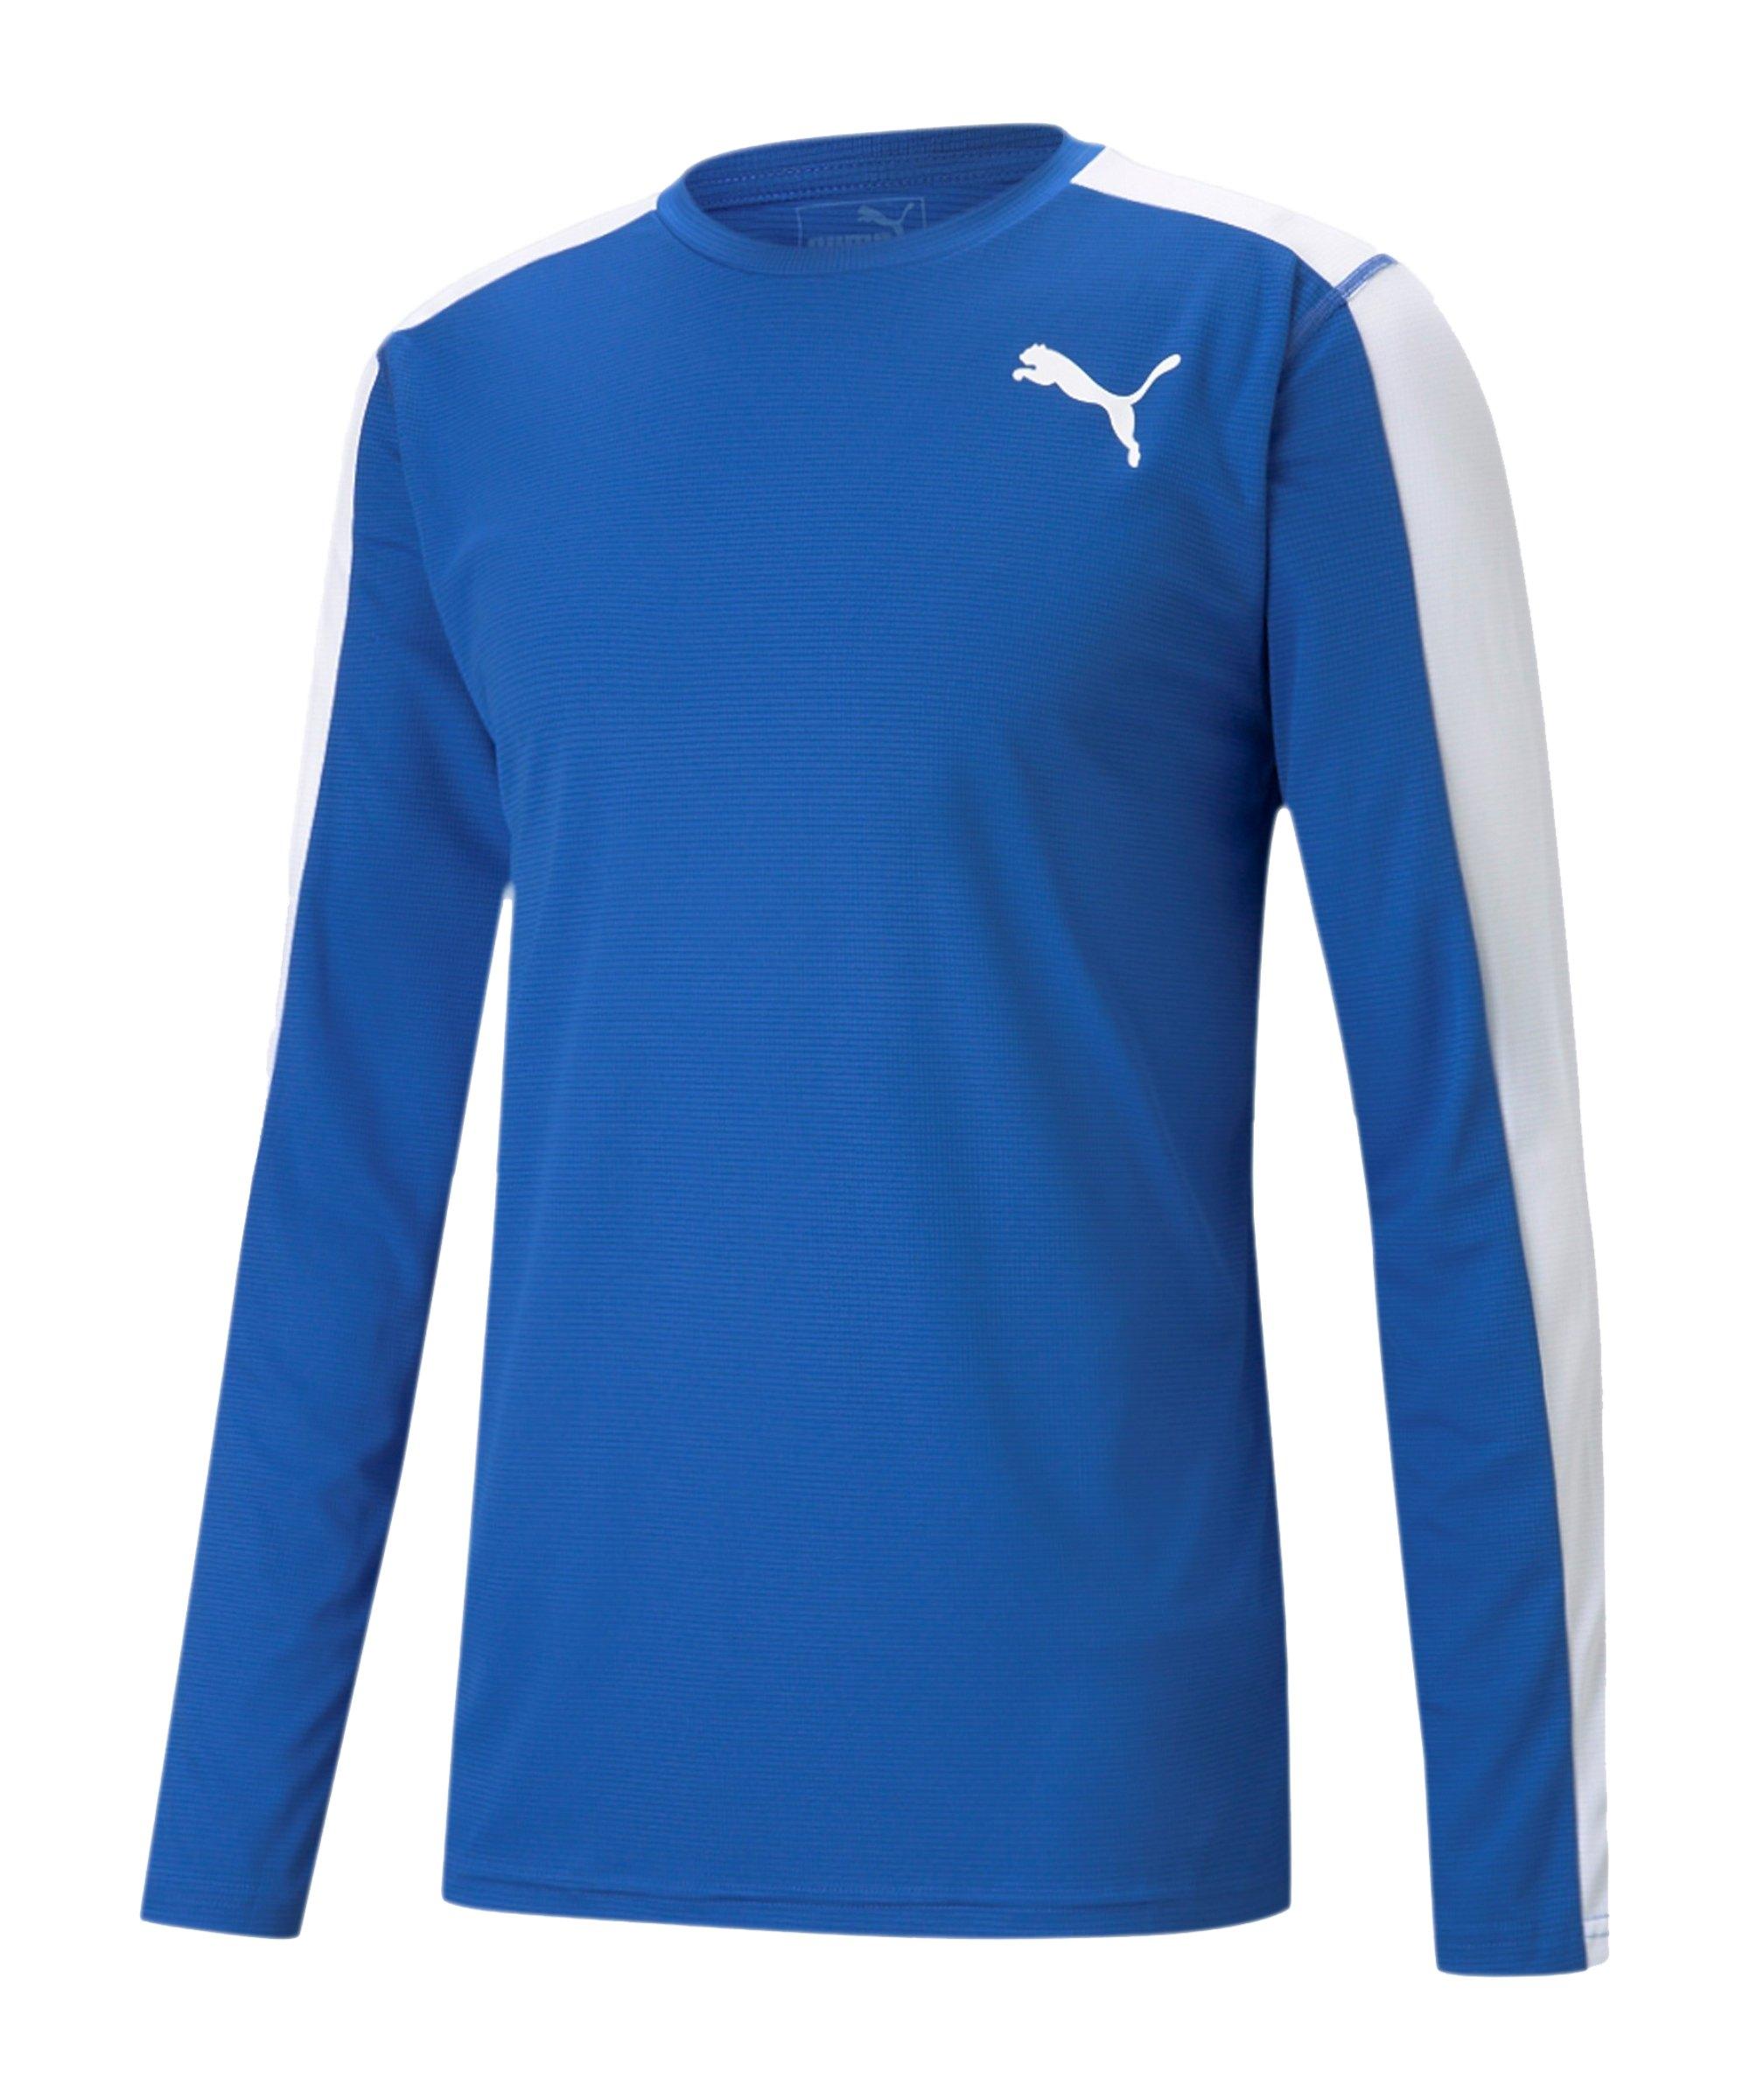 PUMA Cross the Line Sweatshirt Blau Weiss F04 - blau